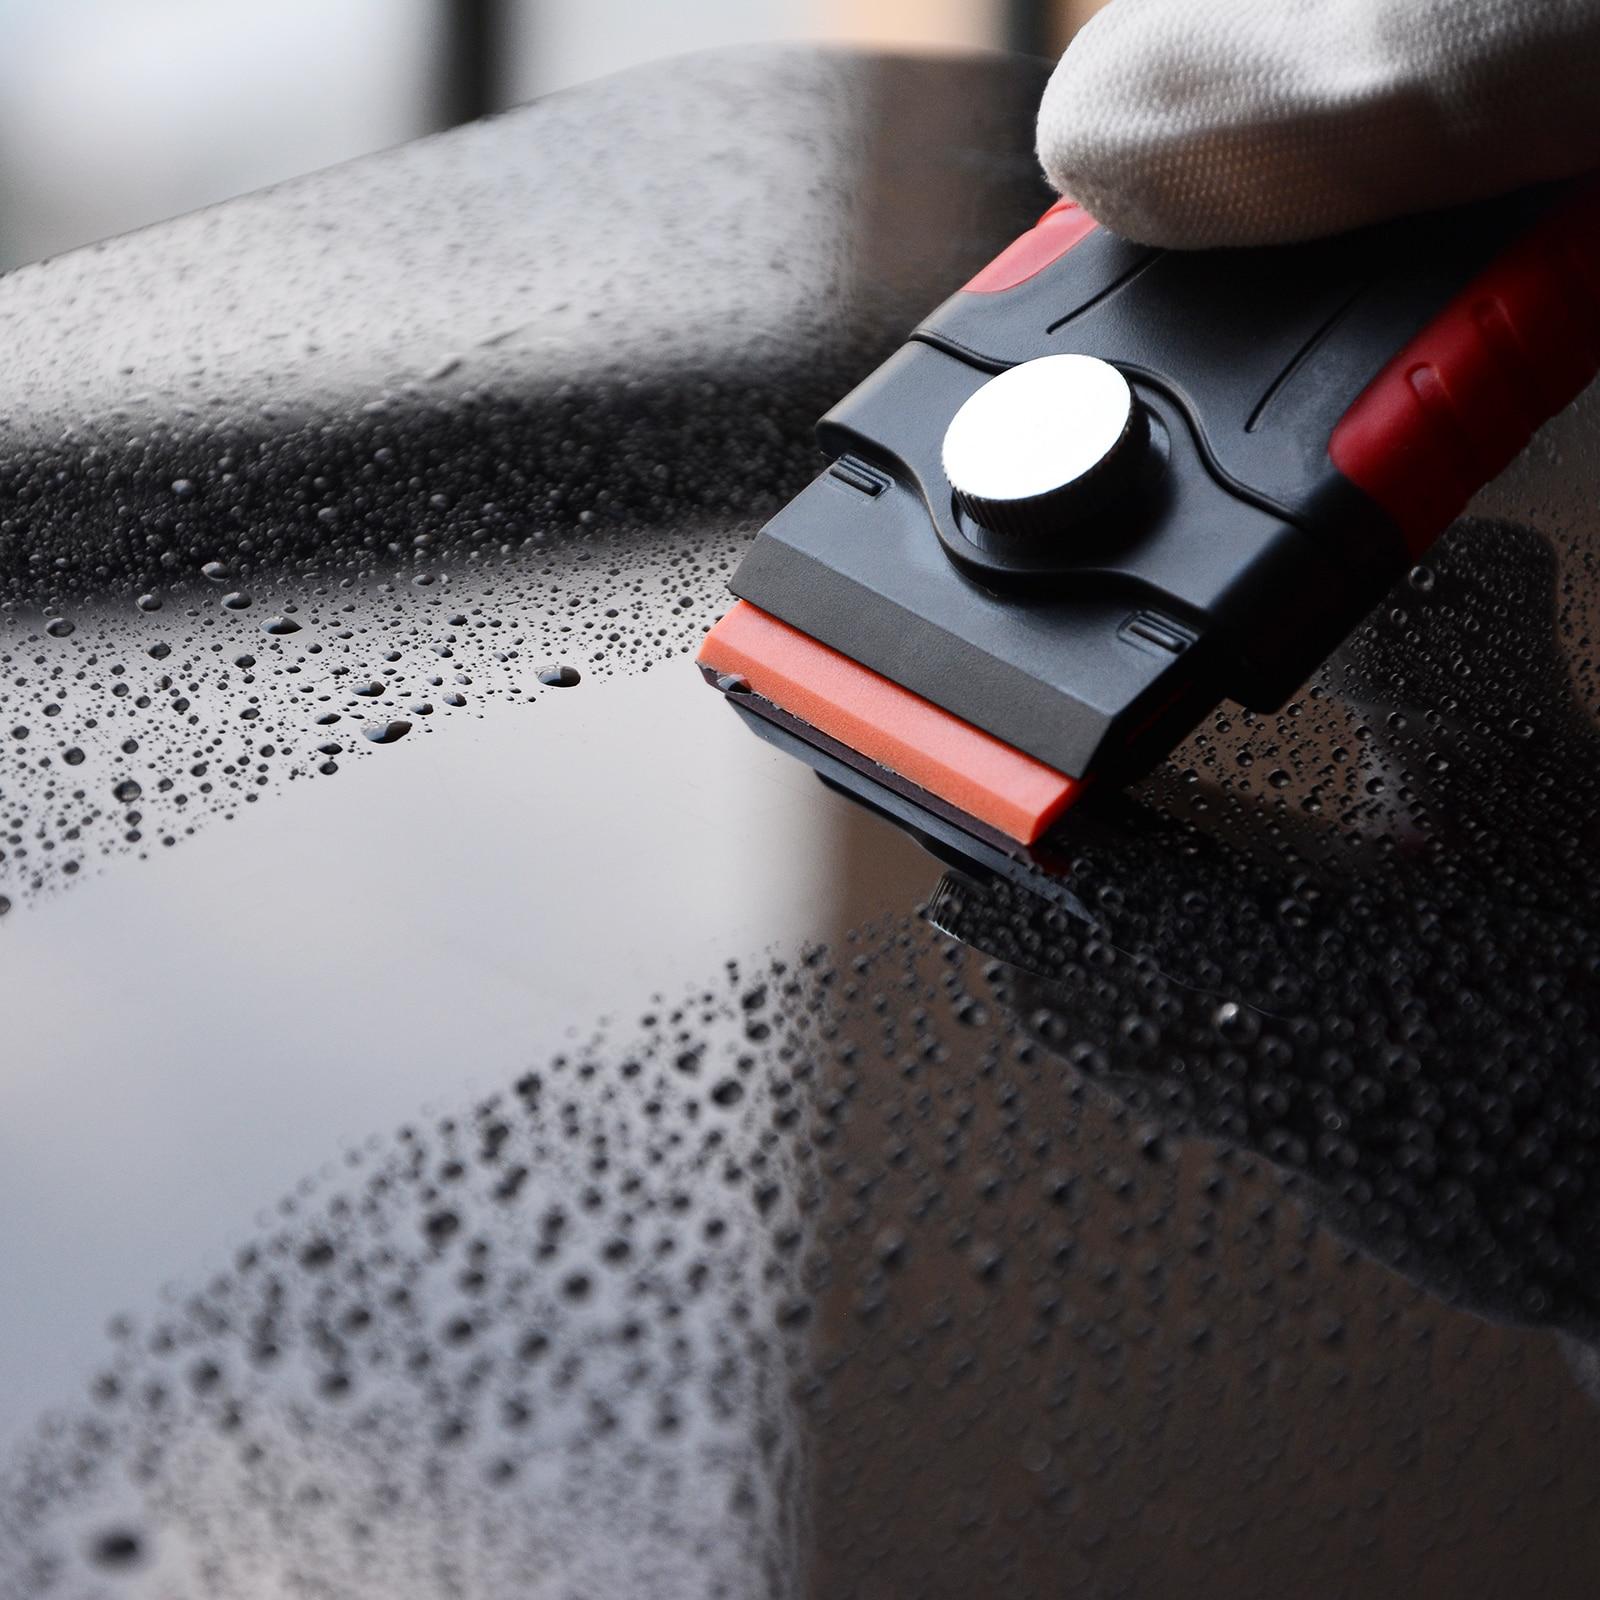 EHDIS Car Tools Window Tint Vinyl Wrap Razor Scraper Ceramic Glass Cleaning Squeegee 5pcs Razor Blade Glue Film Sticker Remover in Scraper from Automobiles Motorcycles